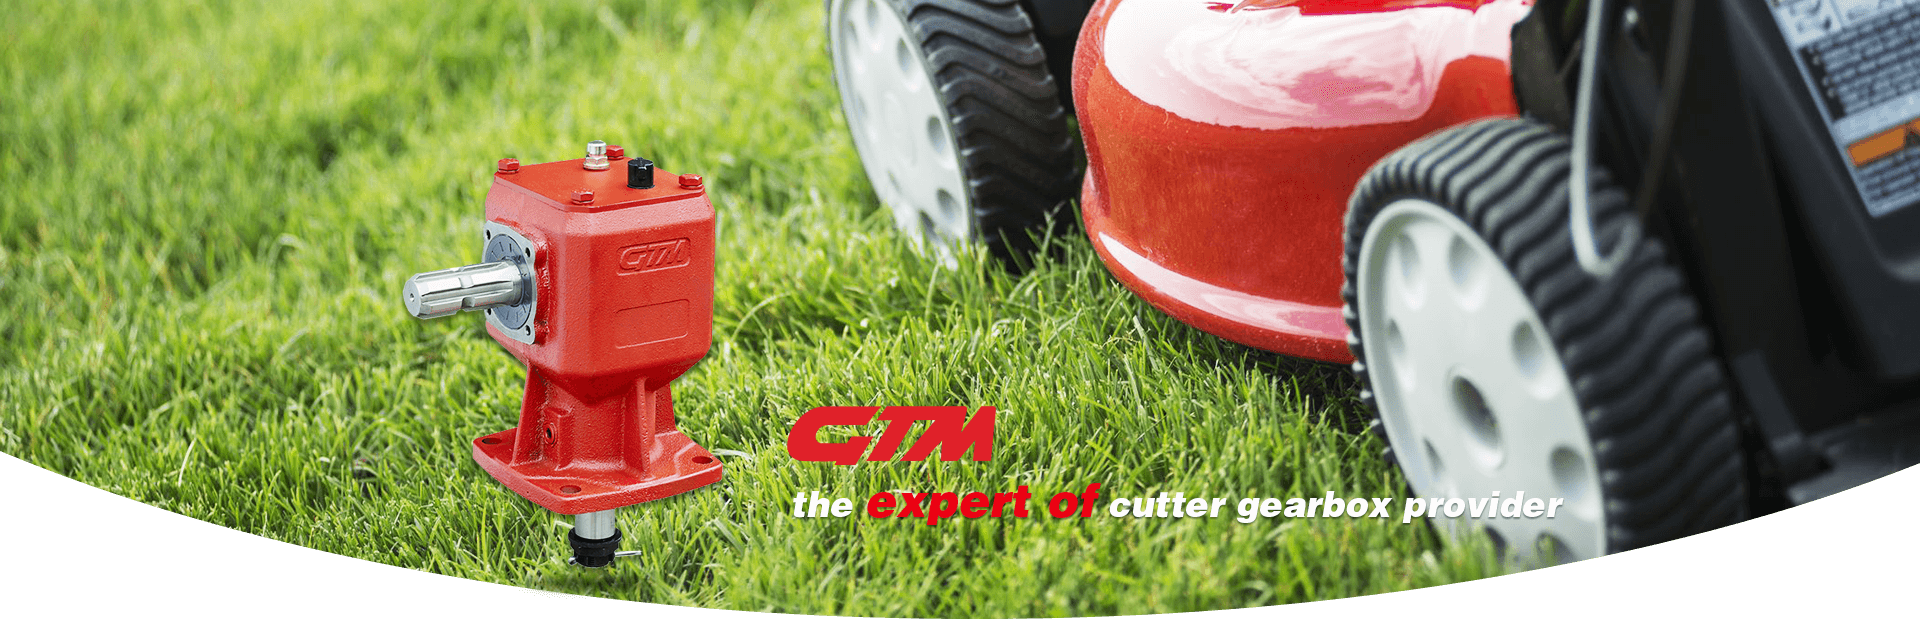 Cutter Gearbox